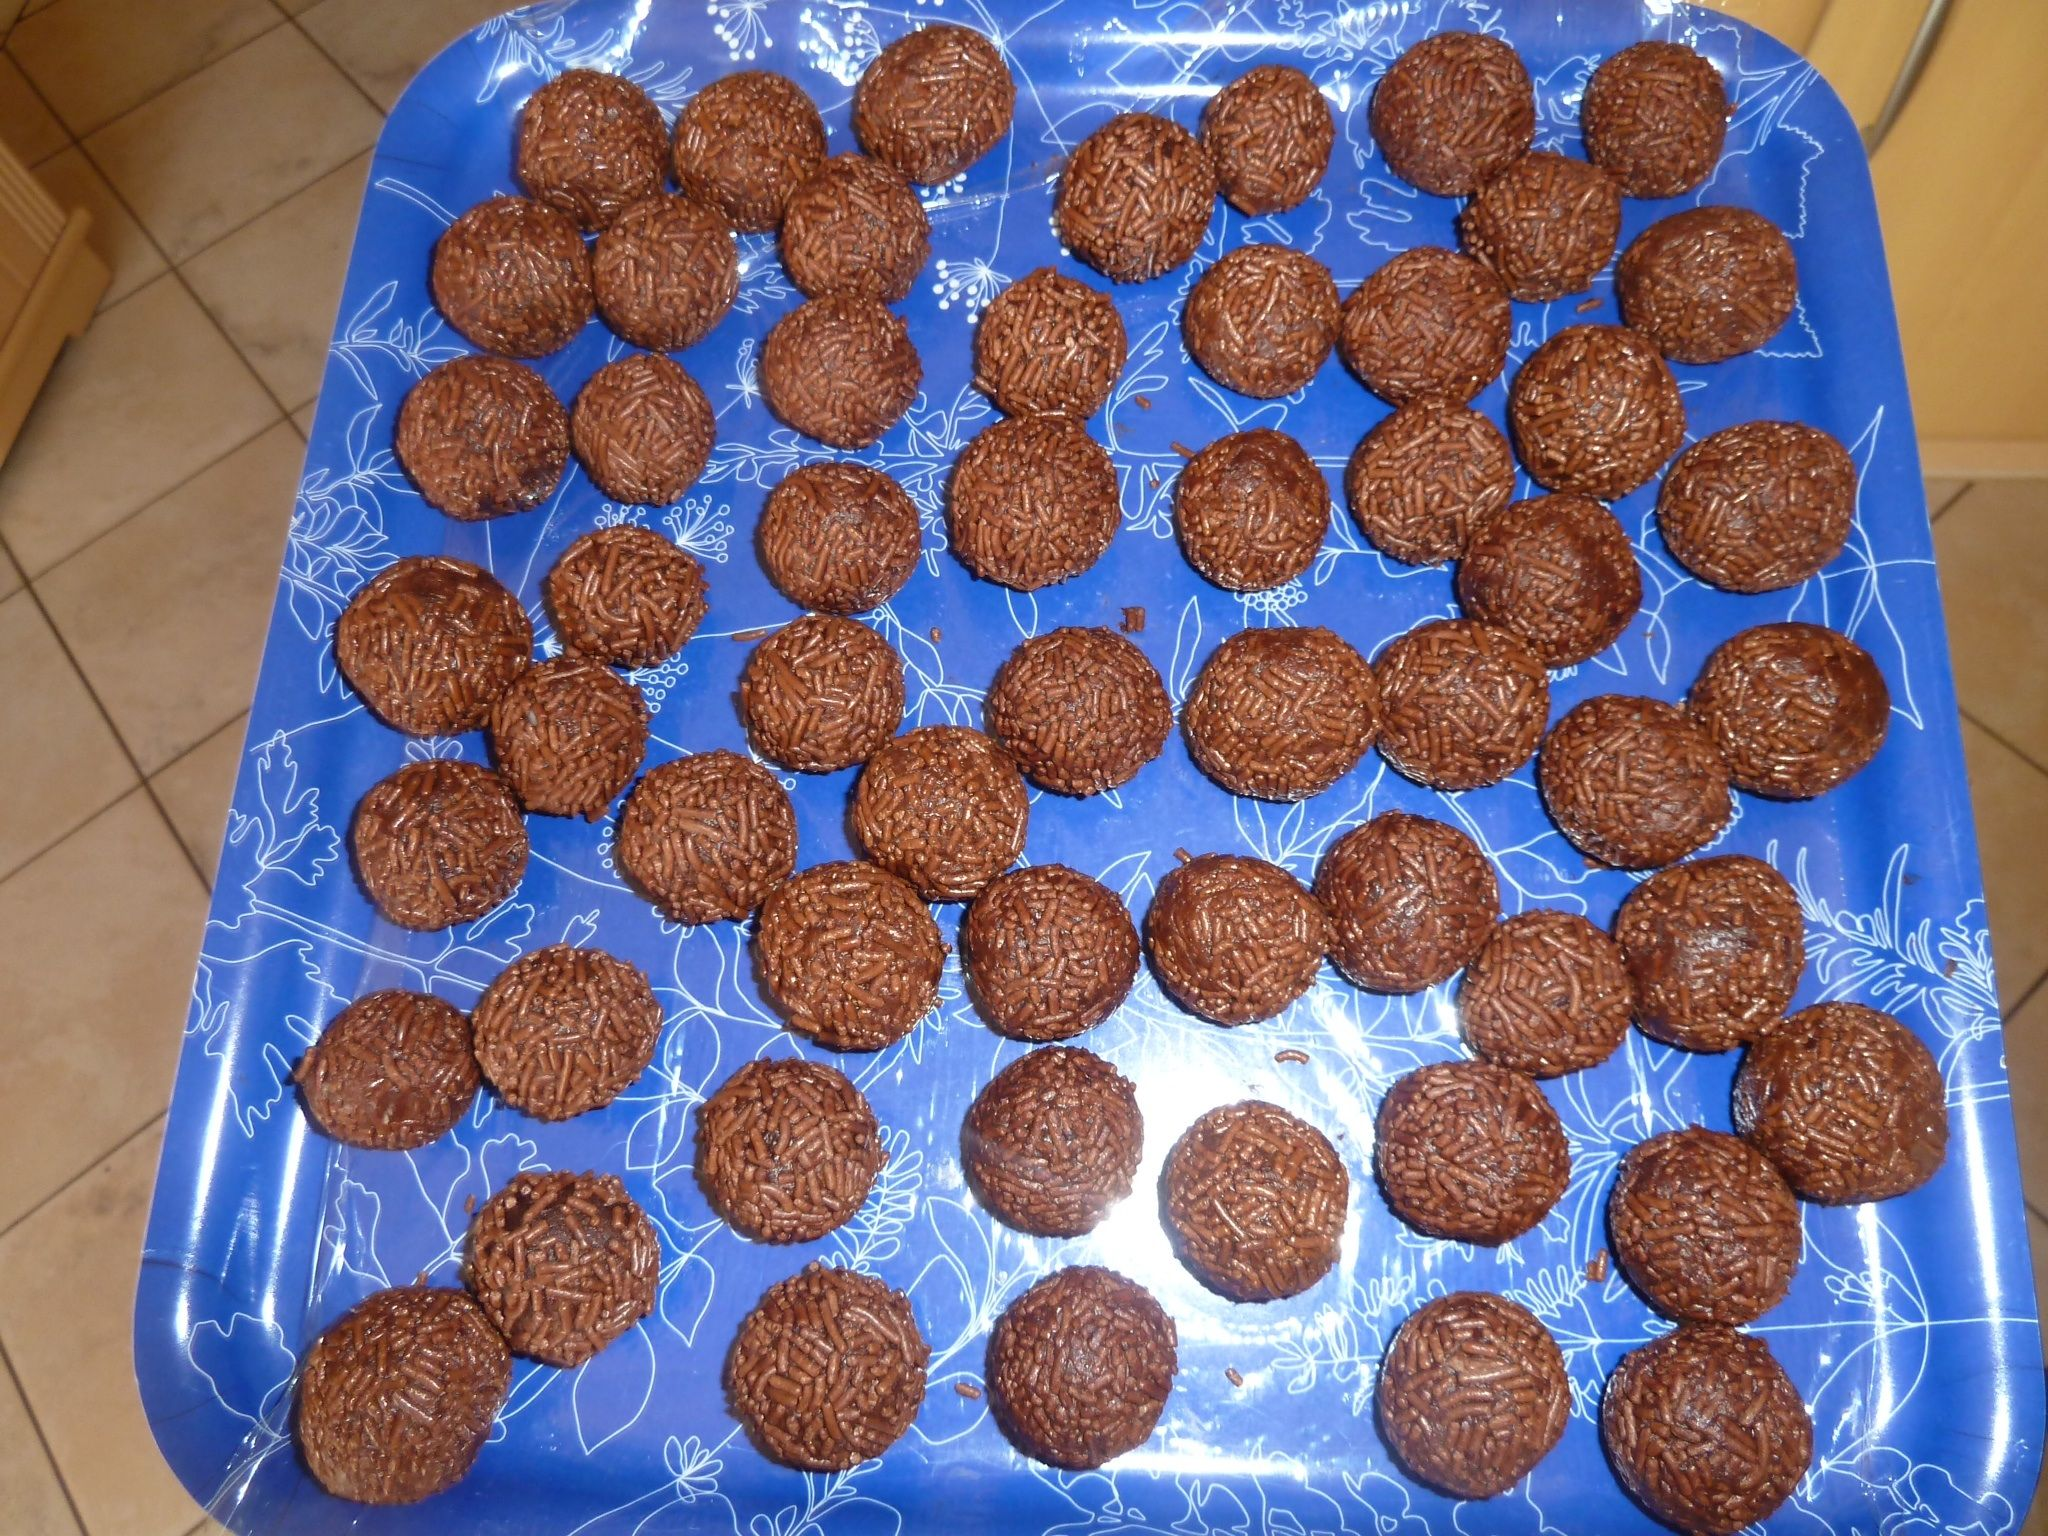 Rumkugeln aus Kuchenbrösel | Rezept | Backen | Desserts ...